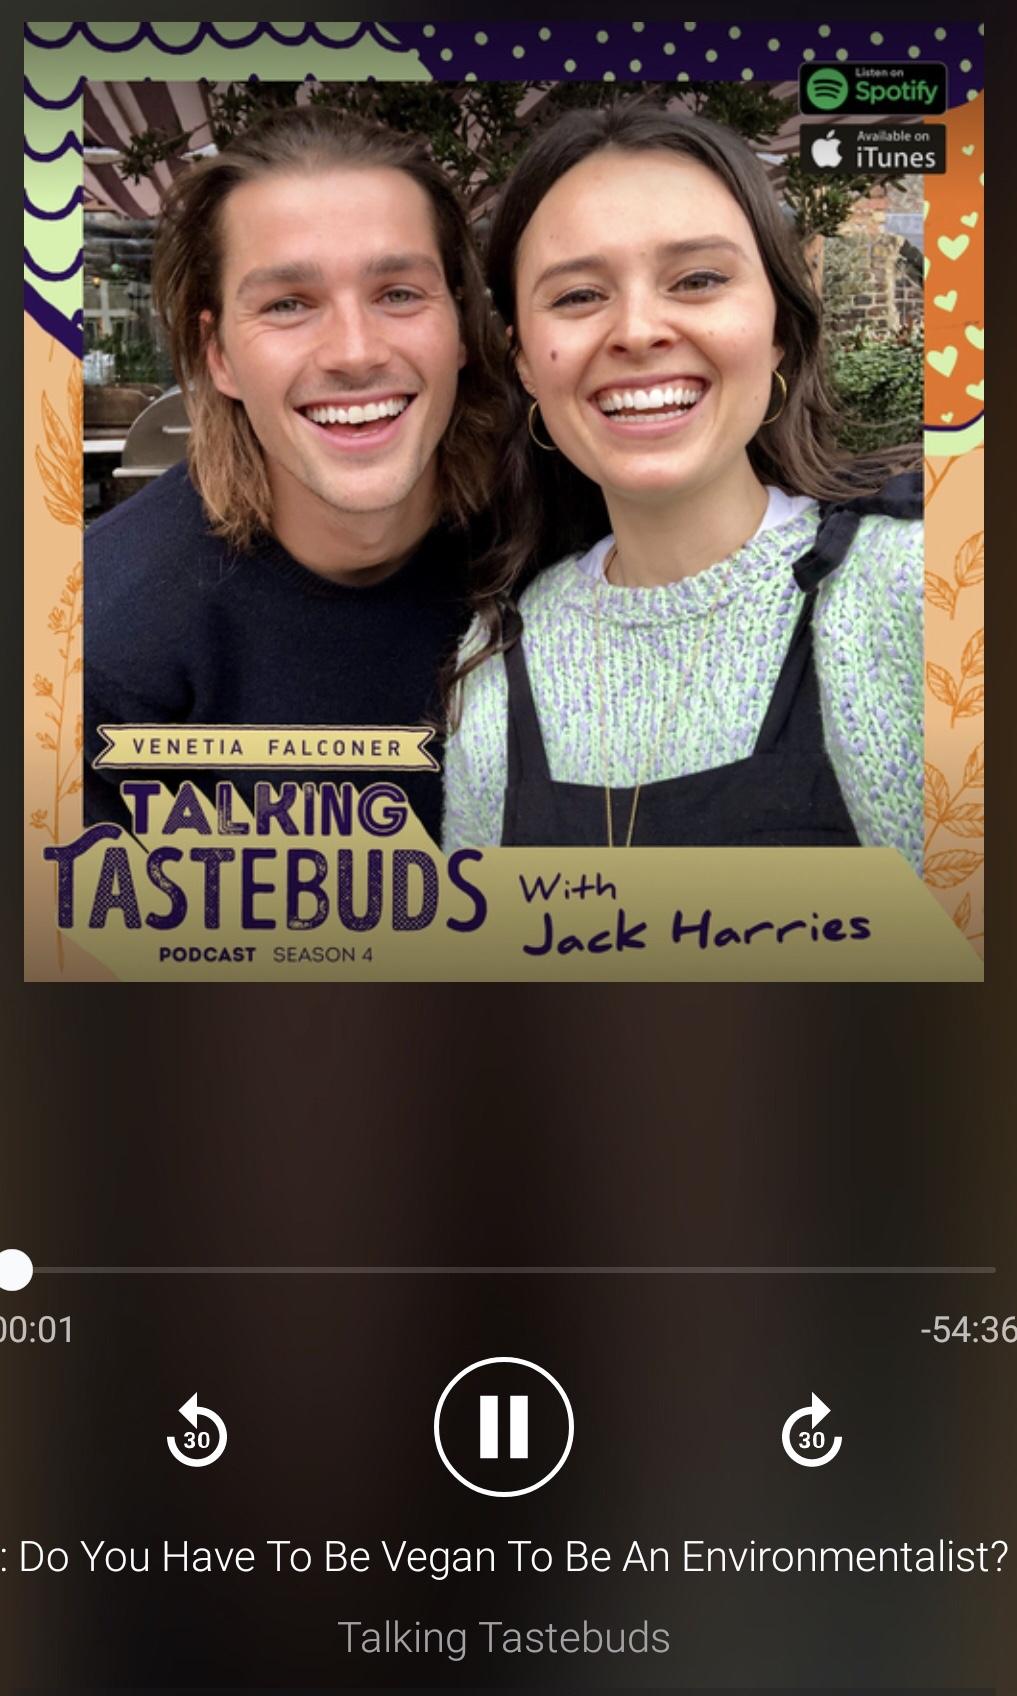 Talking Tastebuds with JackHarries